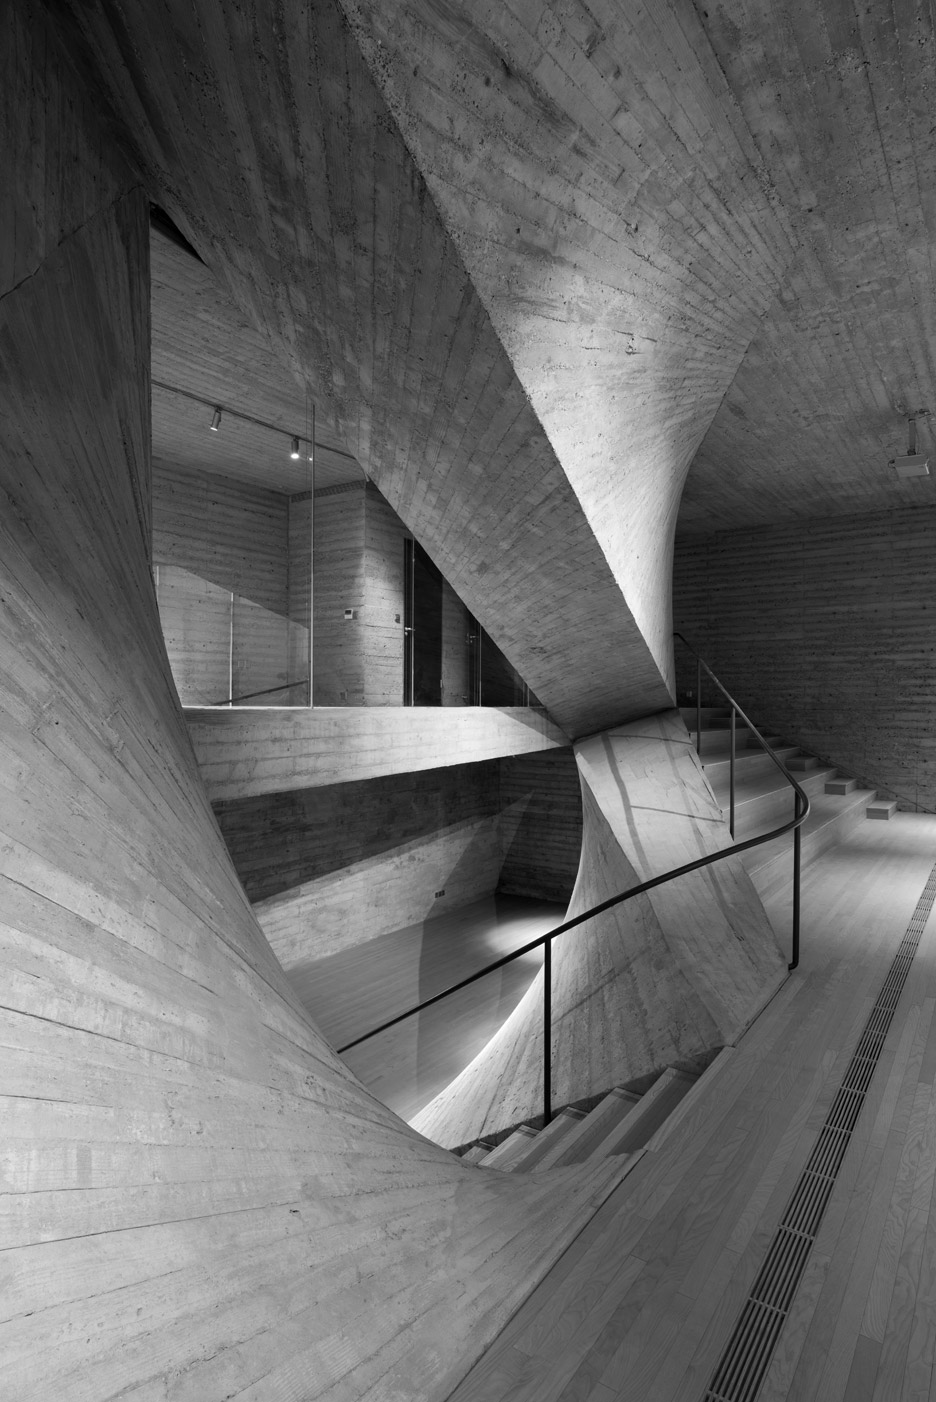 Archi Union Architects Completes Curving Concrete Arts Space Concrete Architecture Concrete Art Conceptual Model Architecture